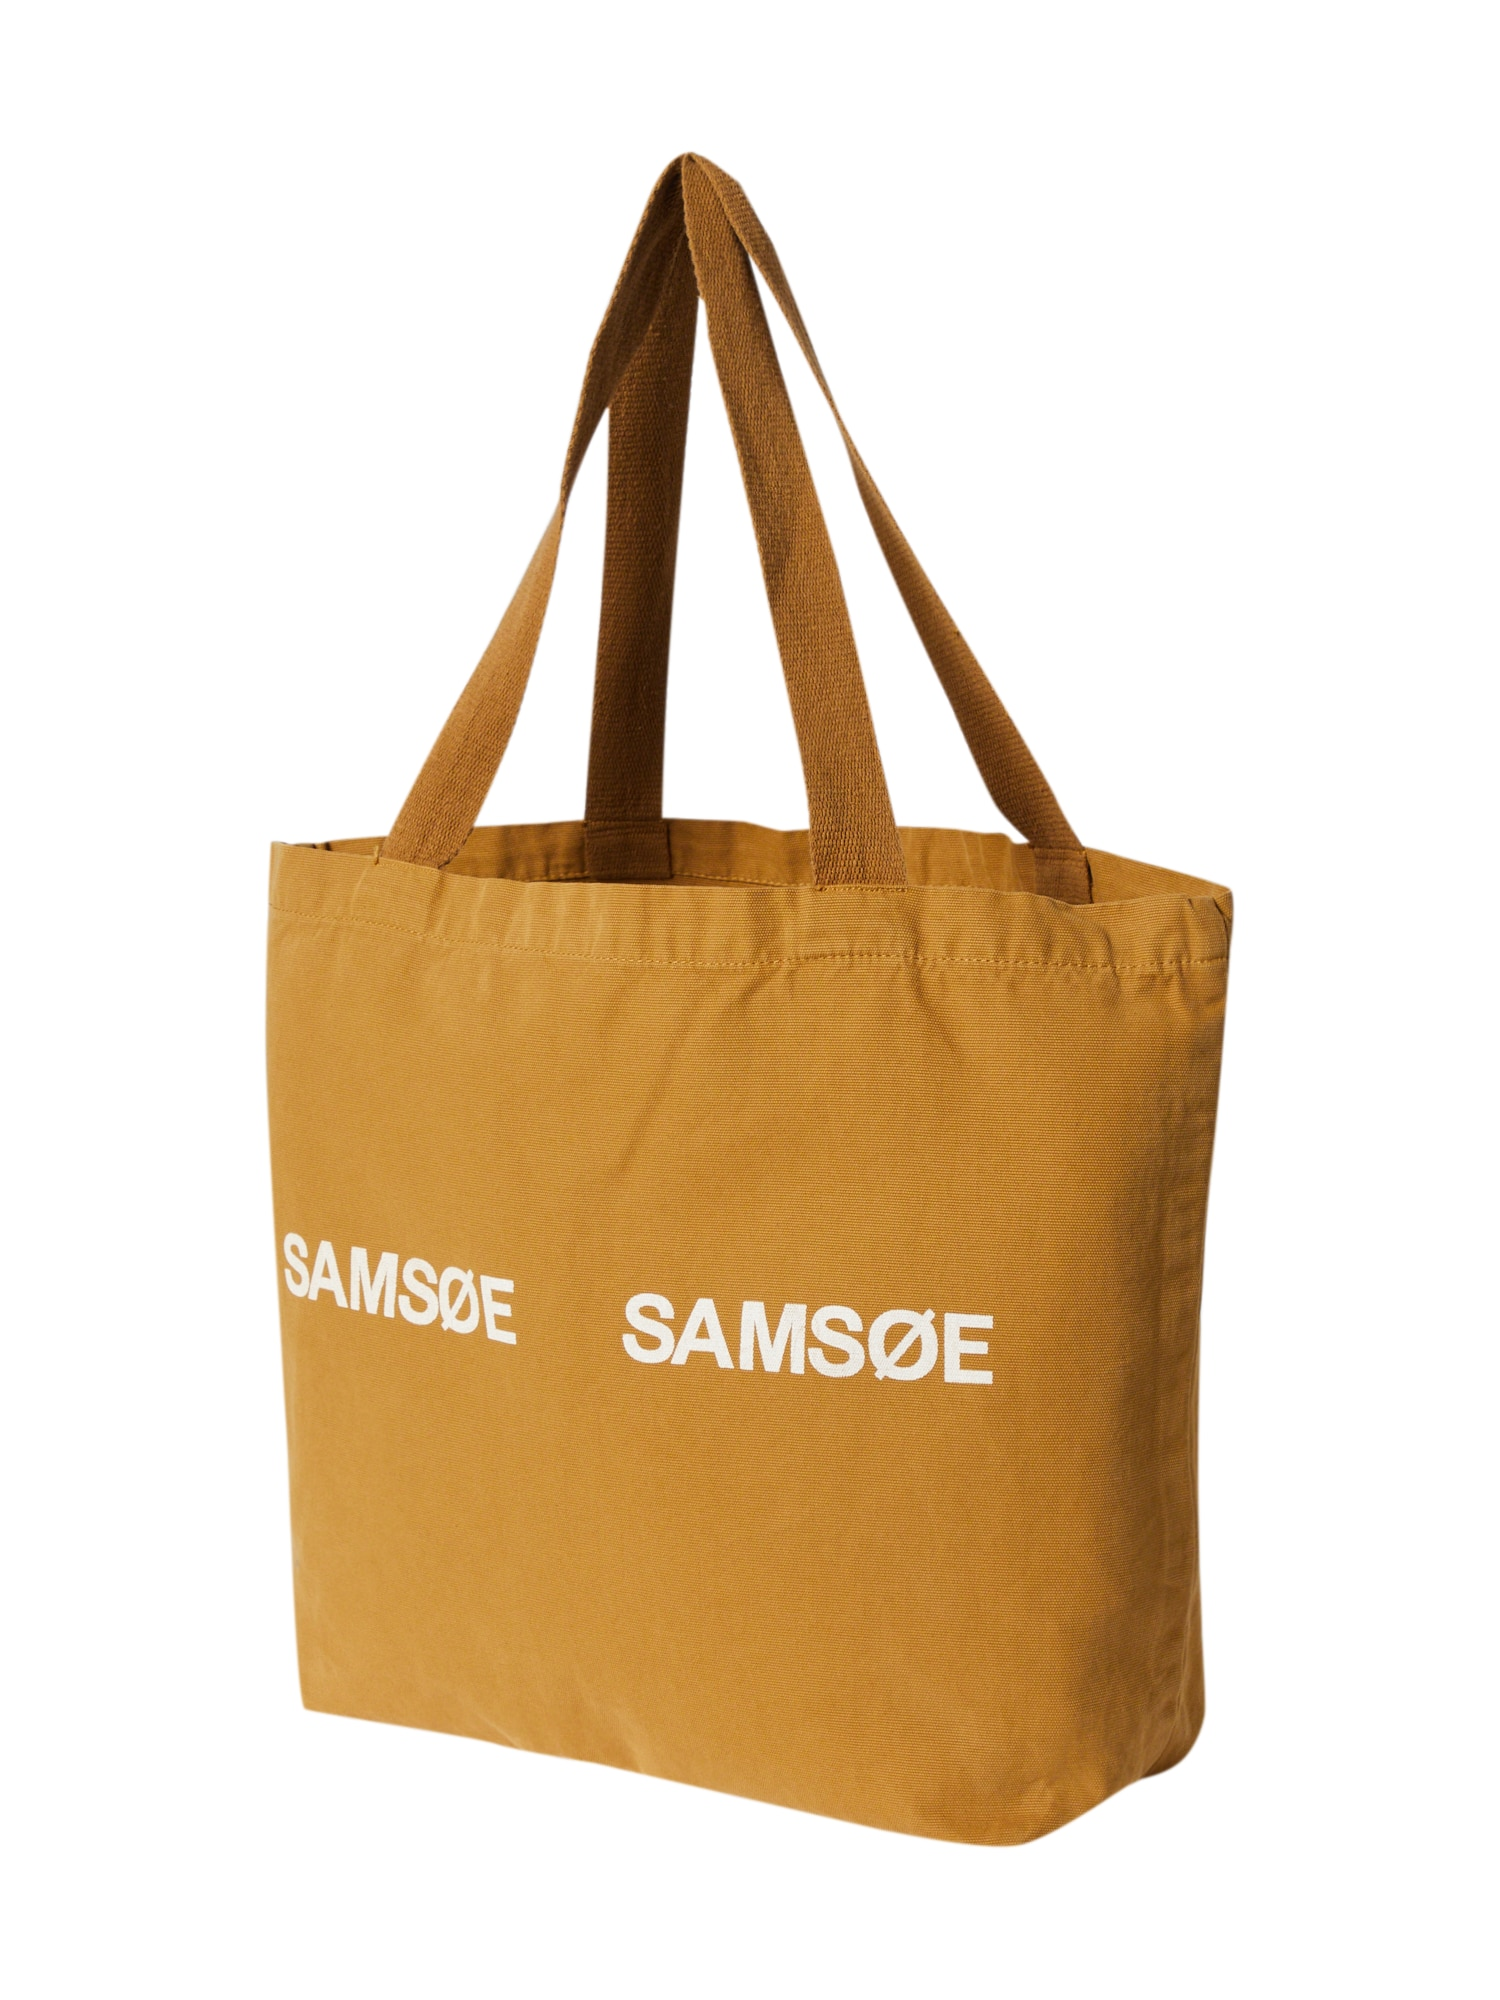 Samsoe Samsoe Pirkinių krepšys 'Frinka' ruda